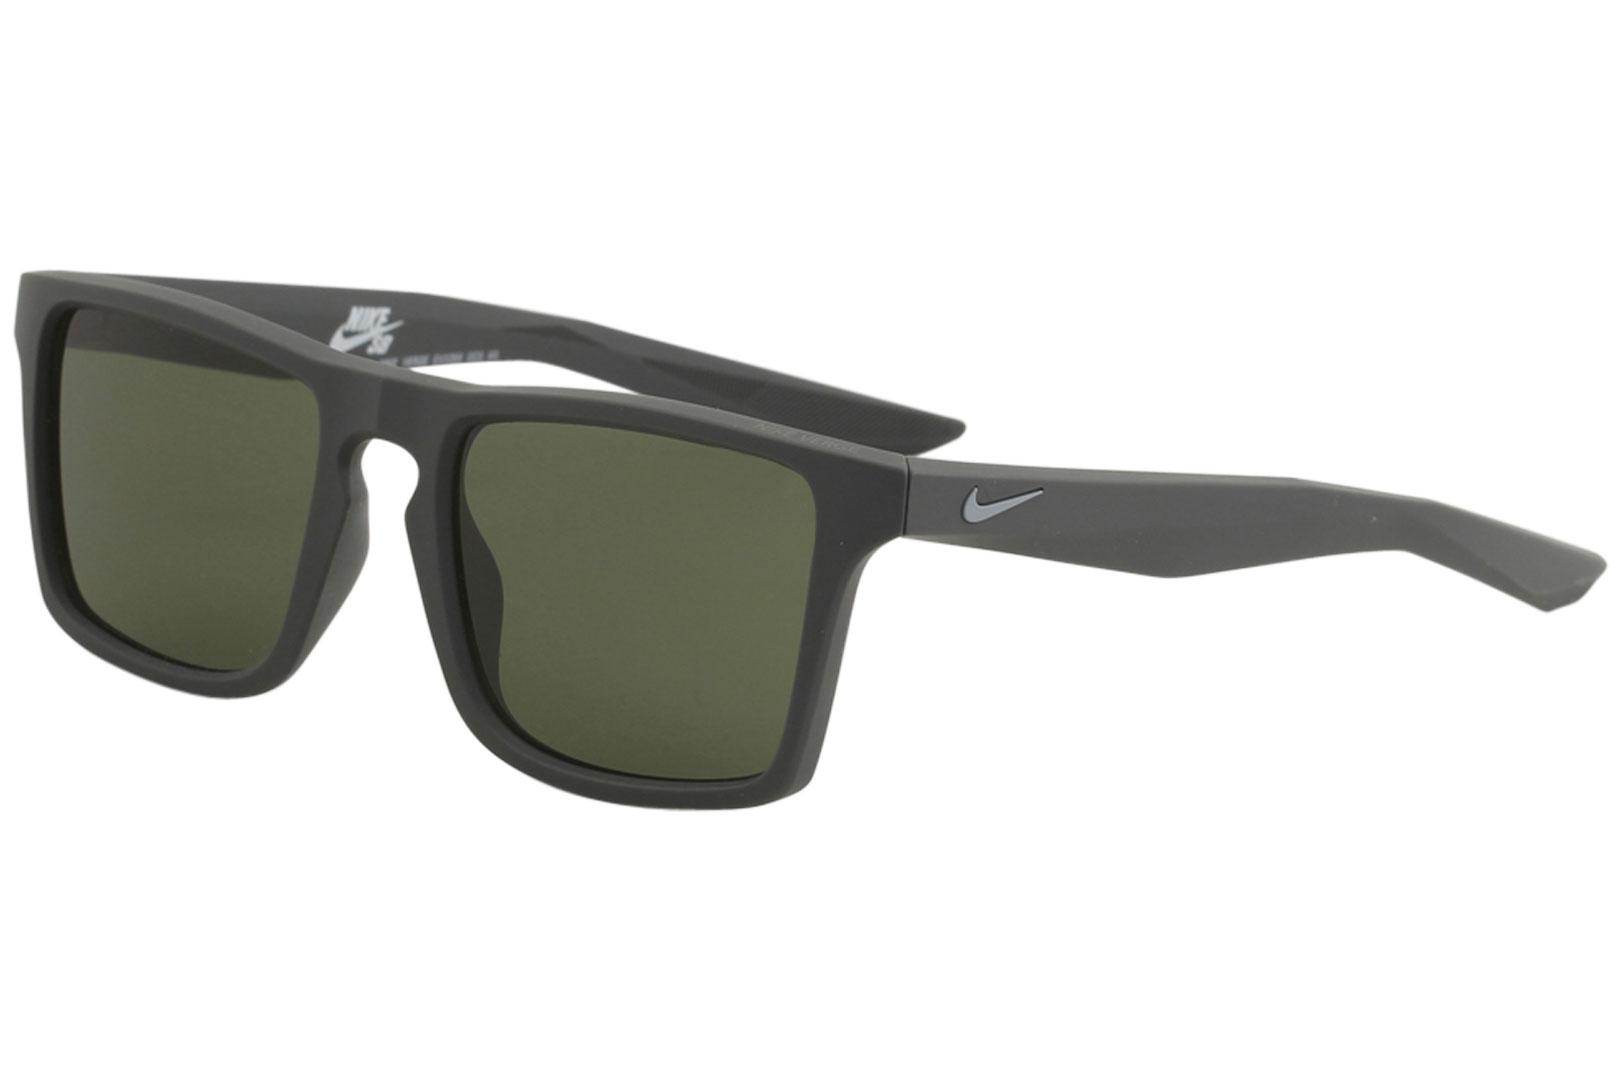 Image of Nike SB Men's Verge EV1059 EV/1059 Sport Square Sunglasses - Anthracite Cool Grey/Green   003 - Lens 52 Bridge 19 Temple 145mm